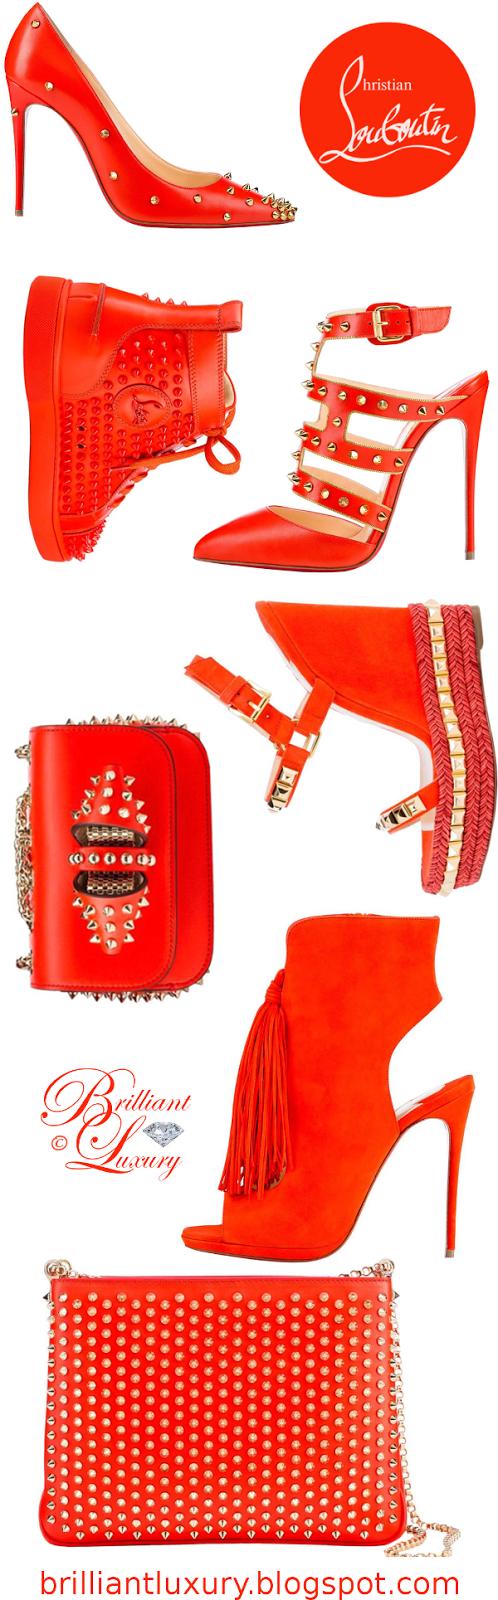 Brilliant Luxury ♦ Christian Louboutin Orange Edition